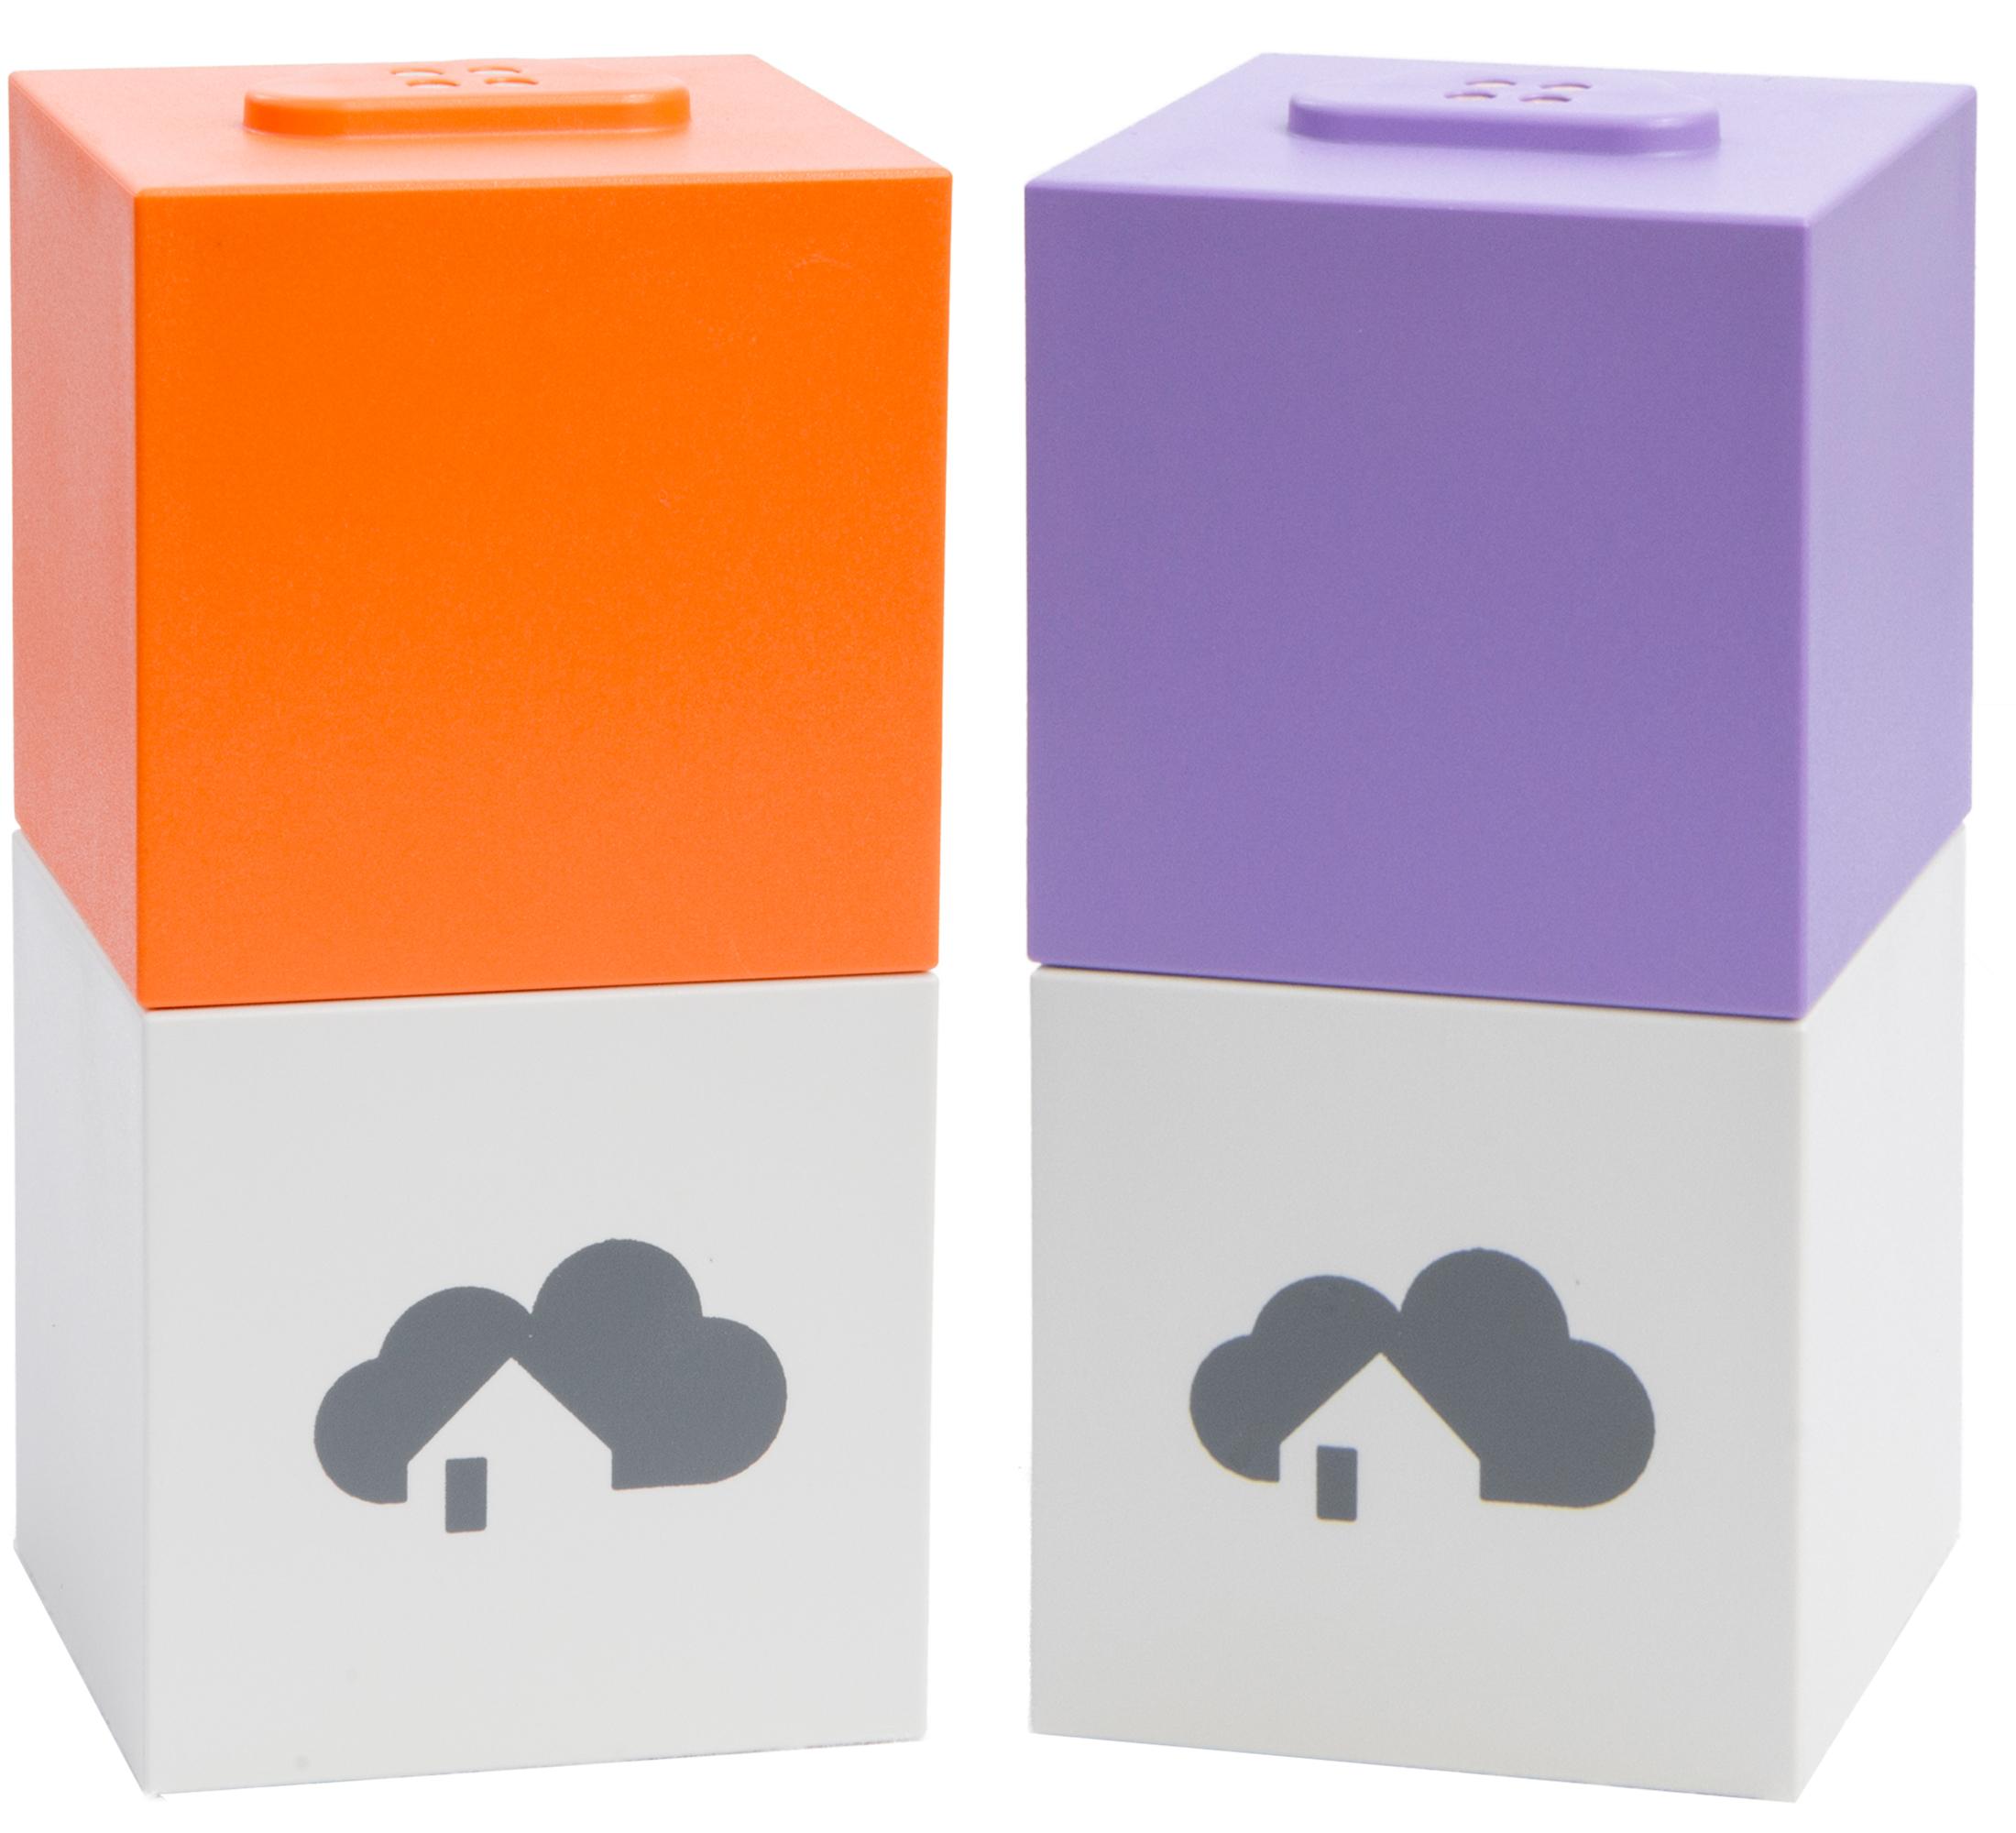 homee brain cube v2 zigbee oder z wave cube smart home. Black Bedroom Furniture Sets. Home Design Ideas